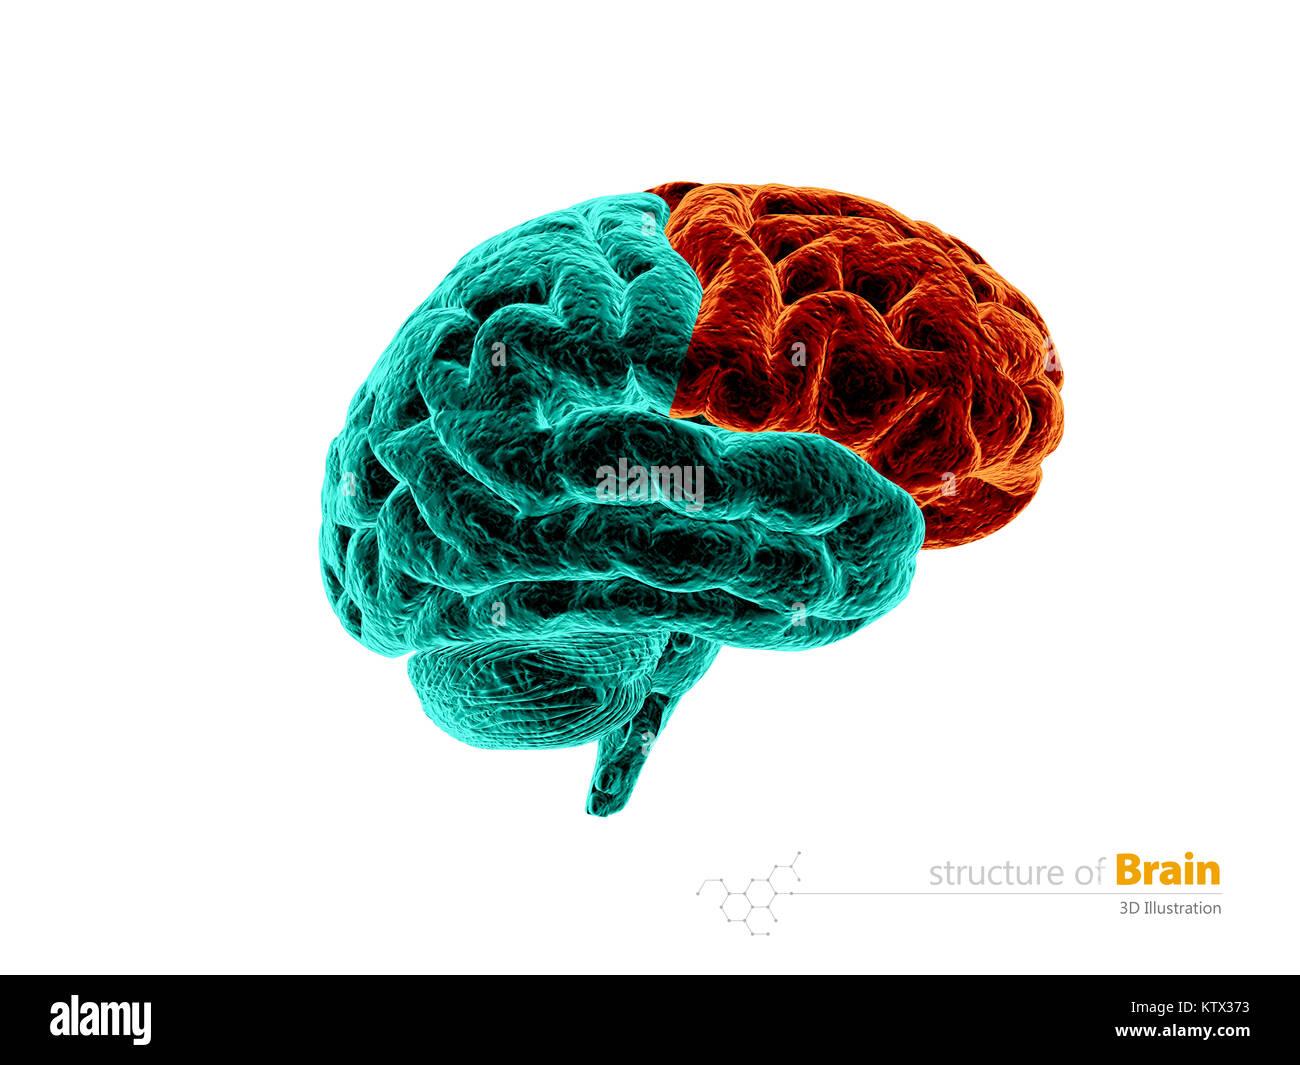 Human Brain Frontal Lobe Anatomy Structure Human Brain Anatomy 3d